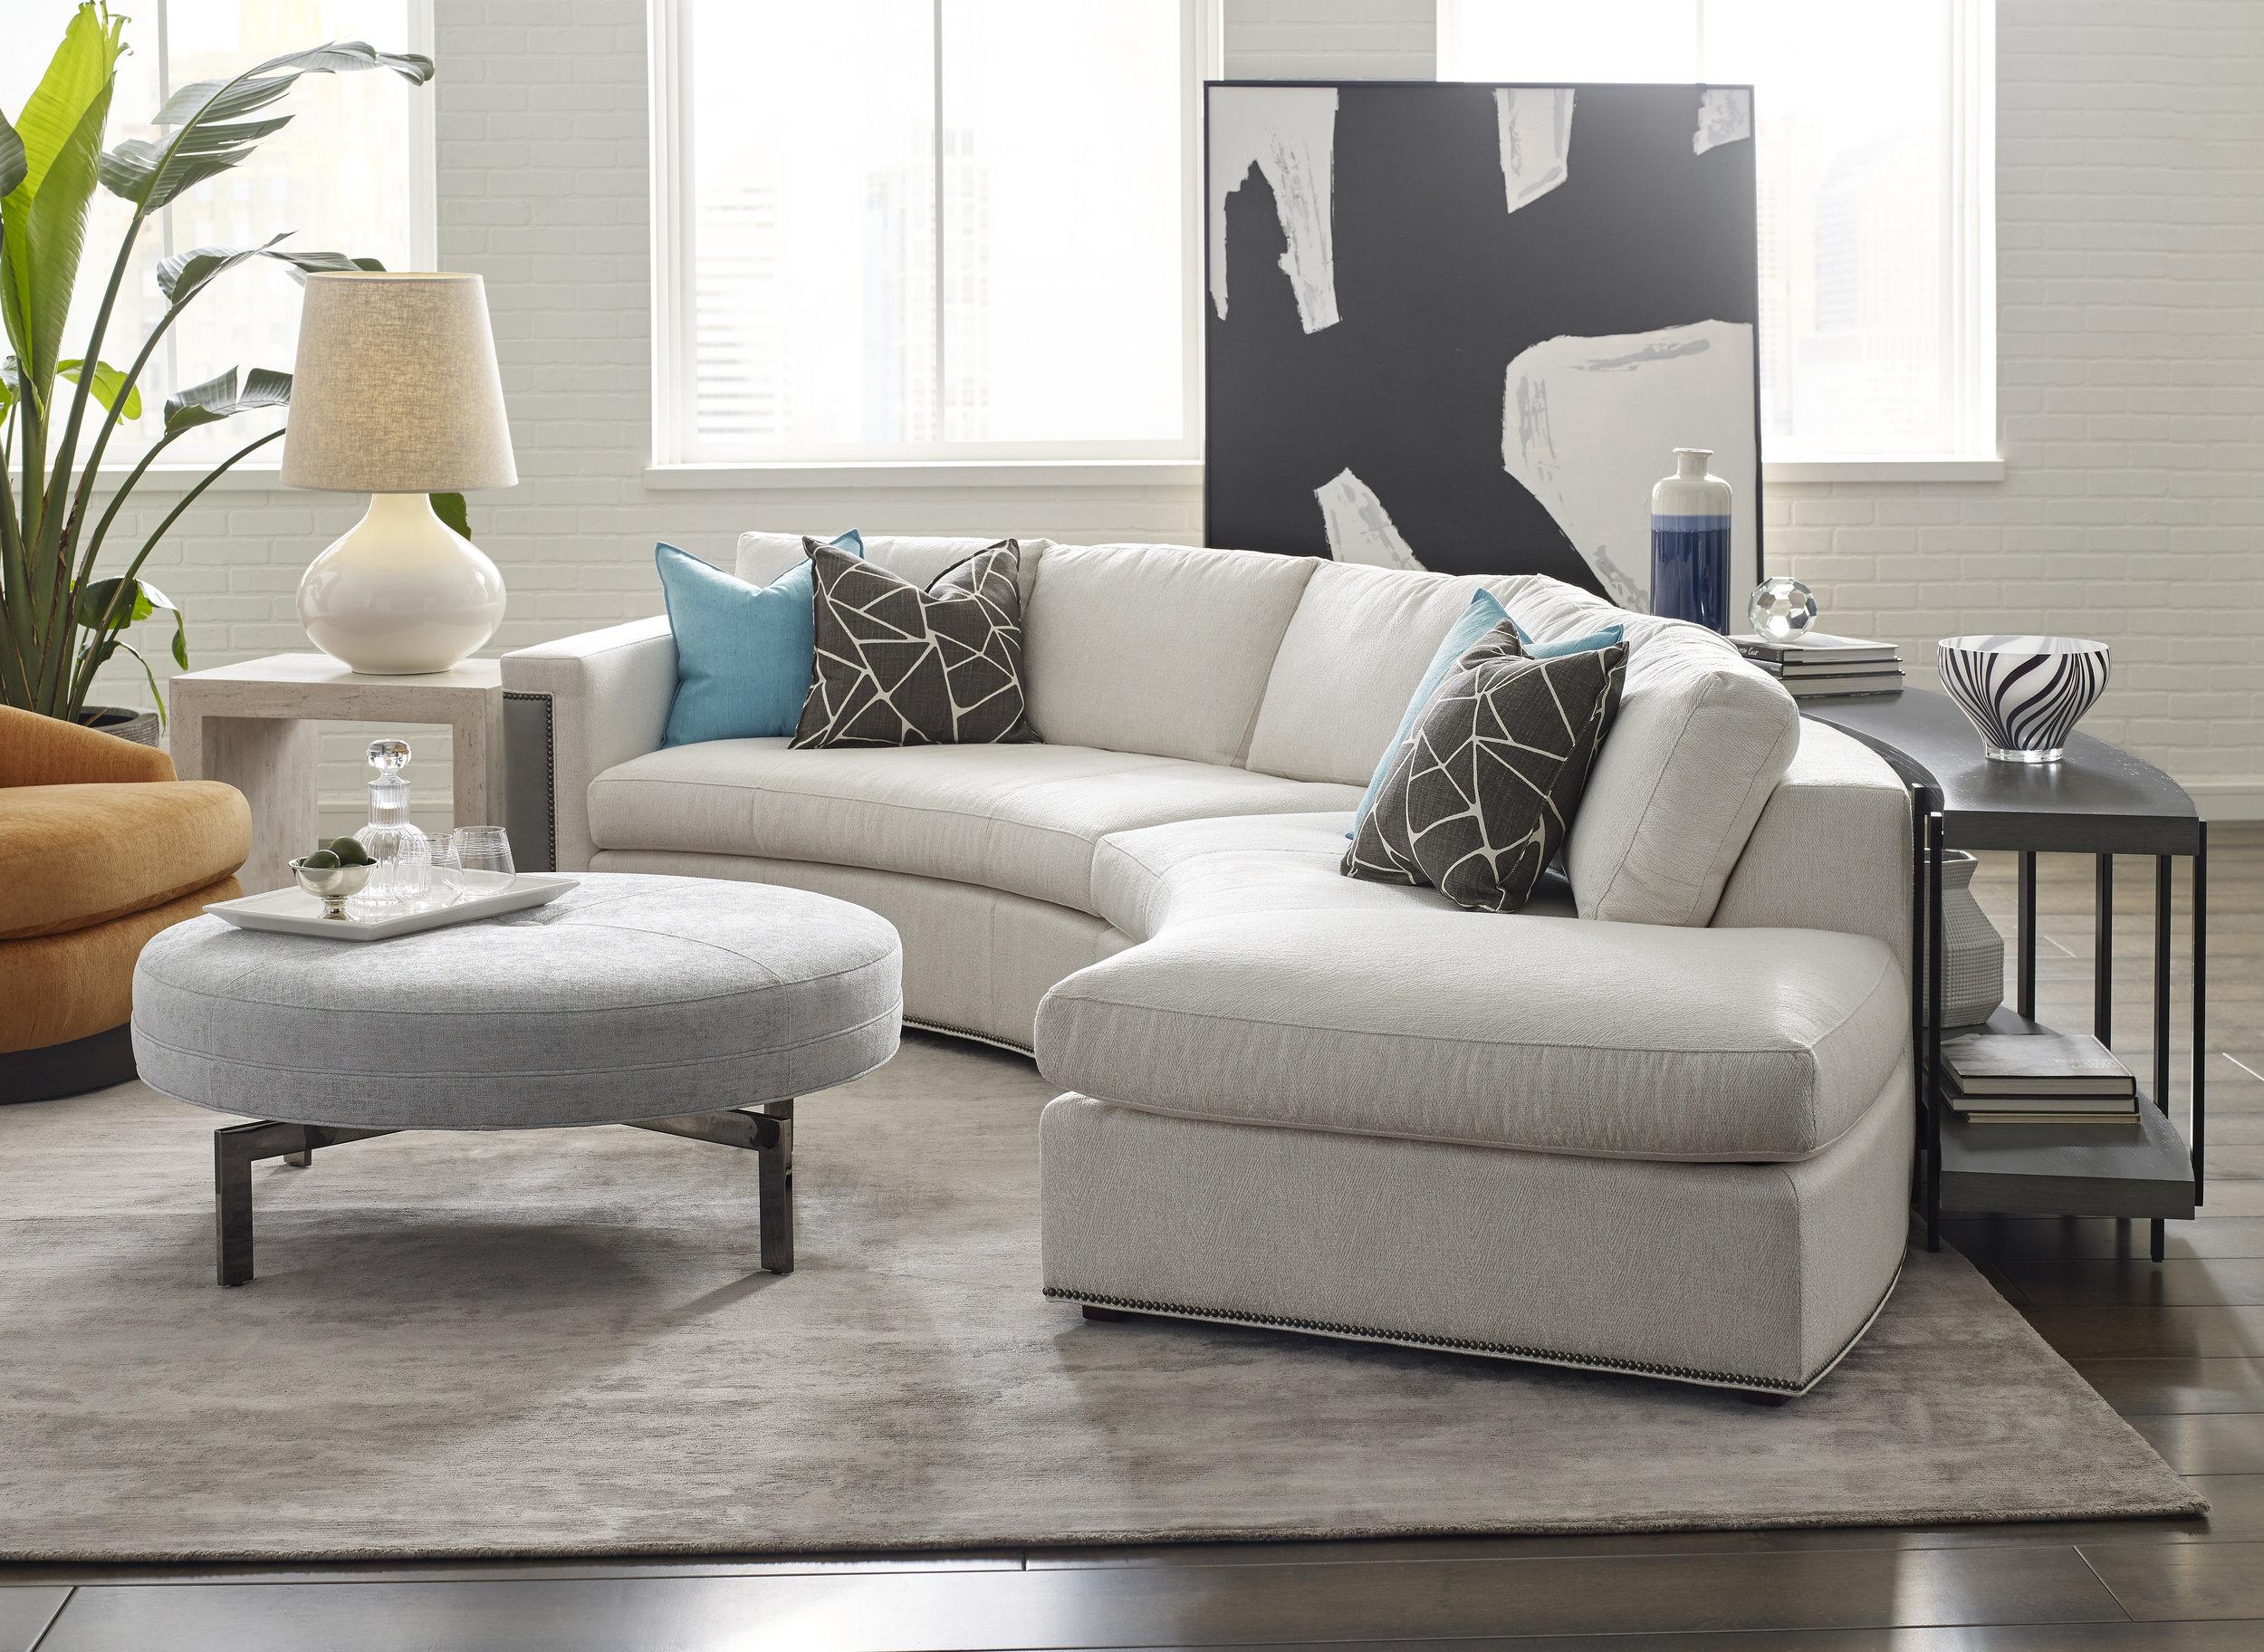 Modern Interior Design Seacoast, NH